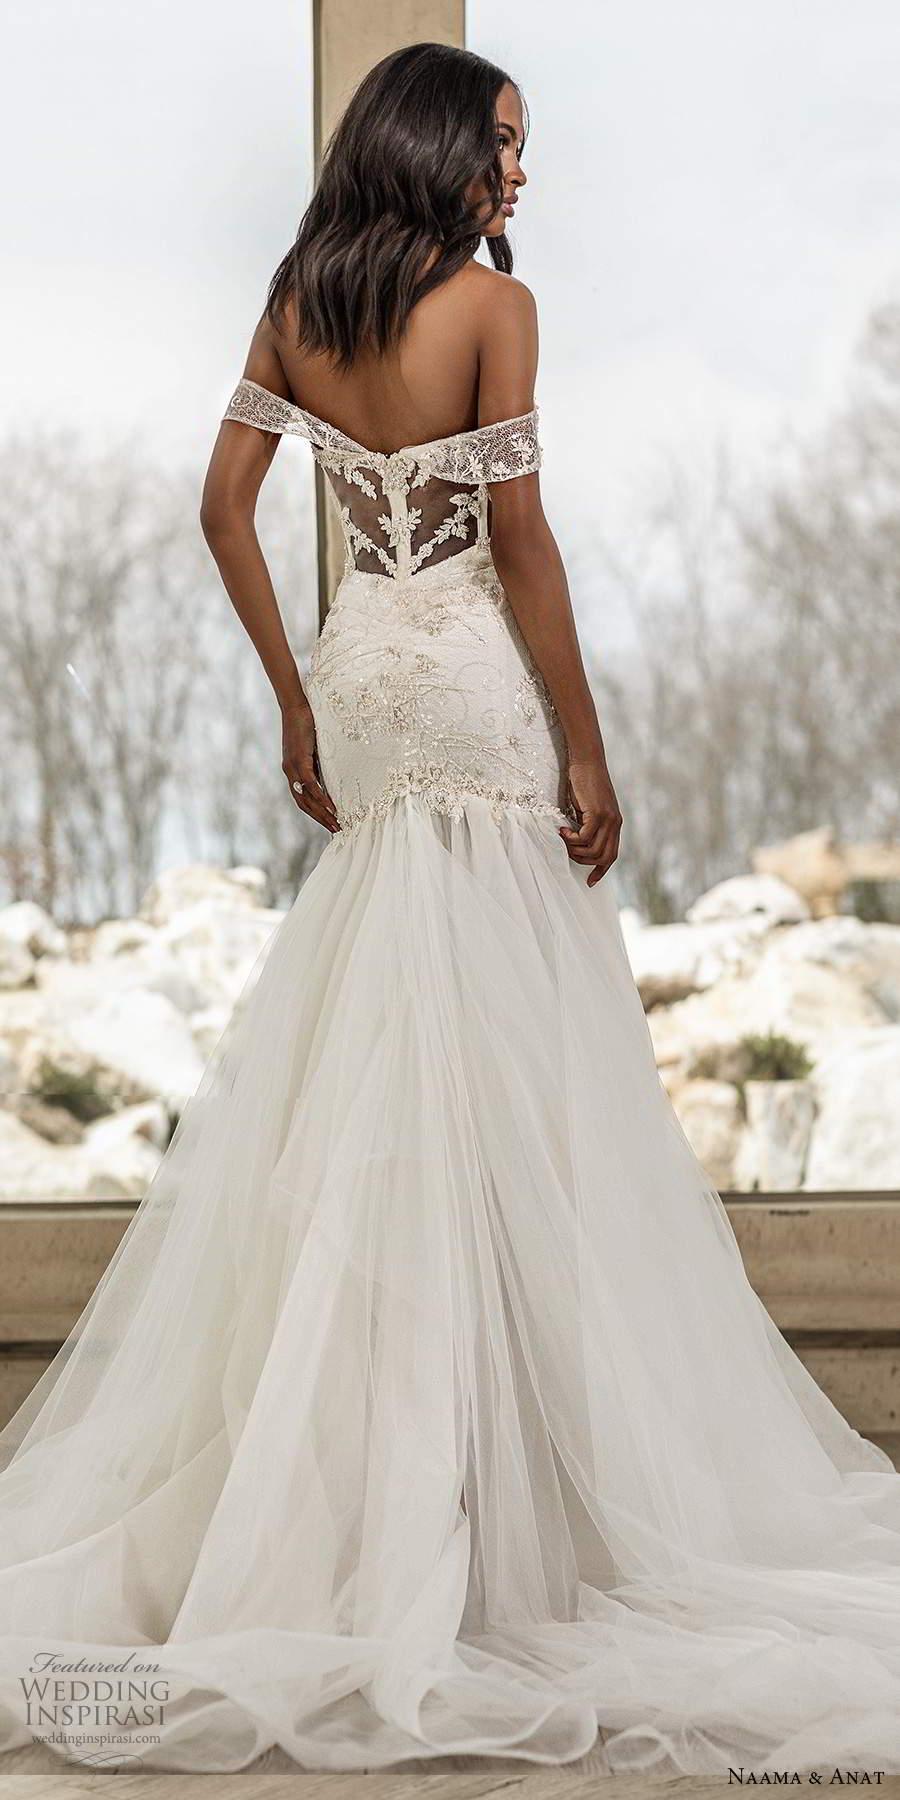 naama anat spring 2020 knottinghill bridal off shoulder sheer straps sweetheart neckline embellished bodice fit flare mermaid wedding dress sheer back chapel train (8) bv